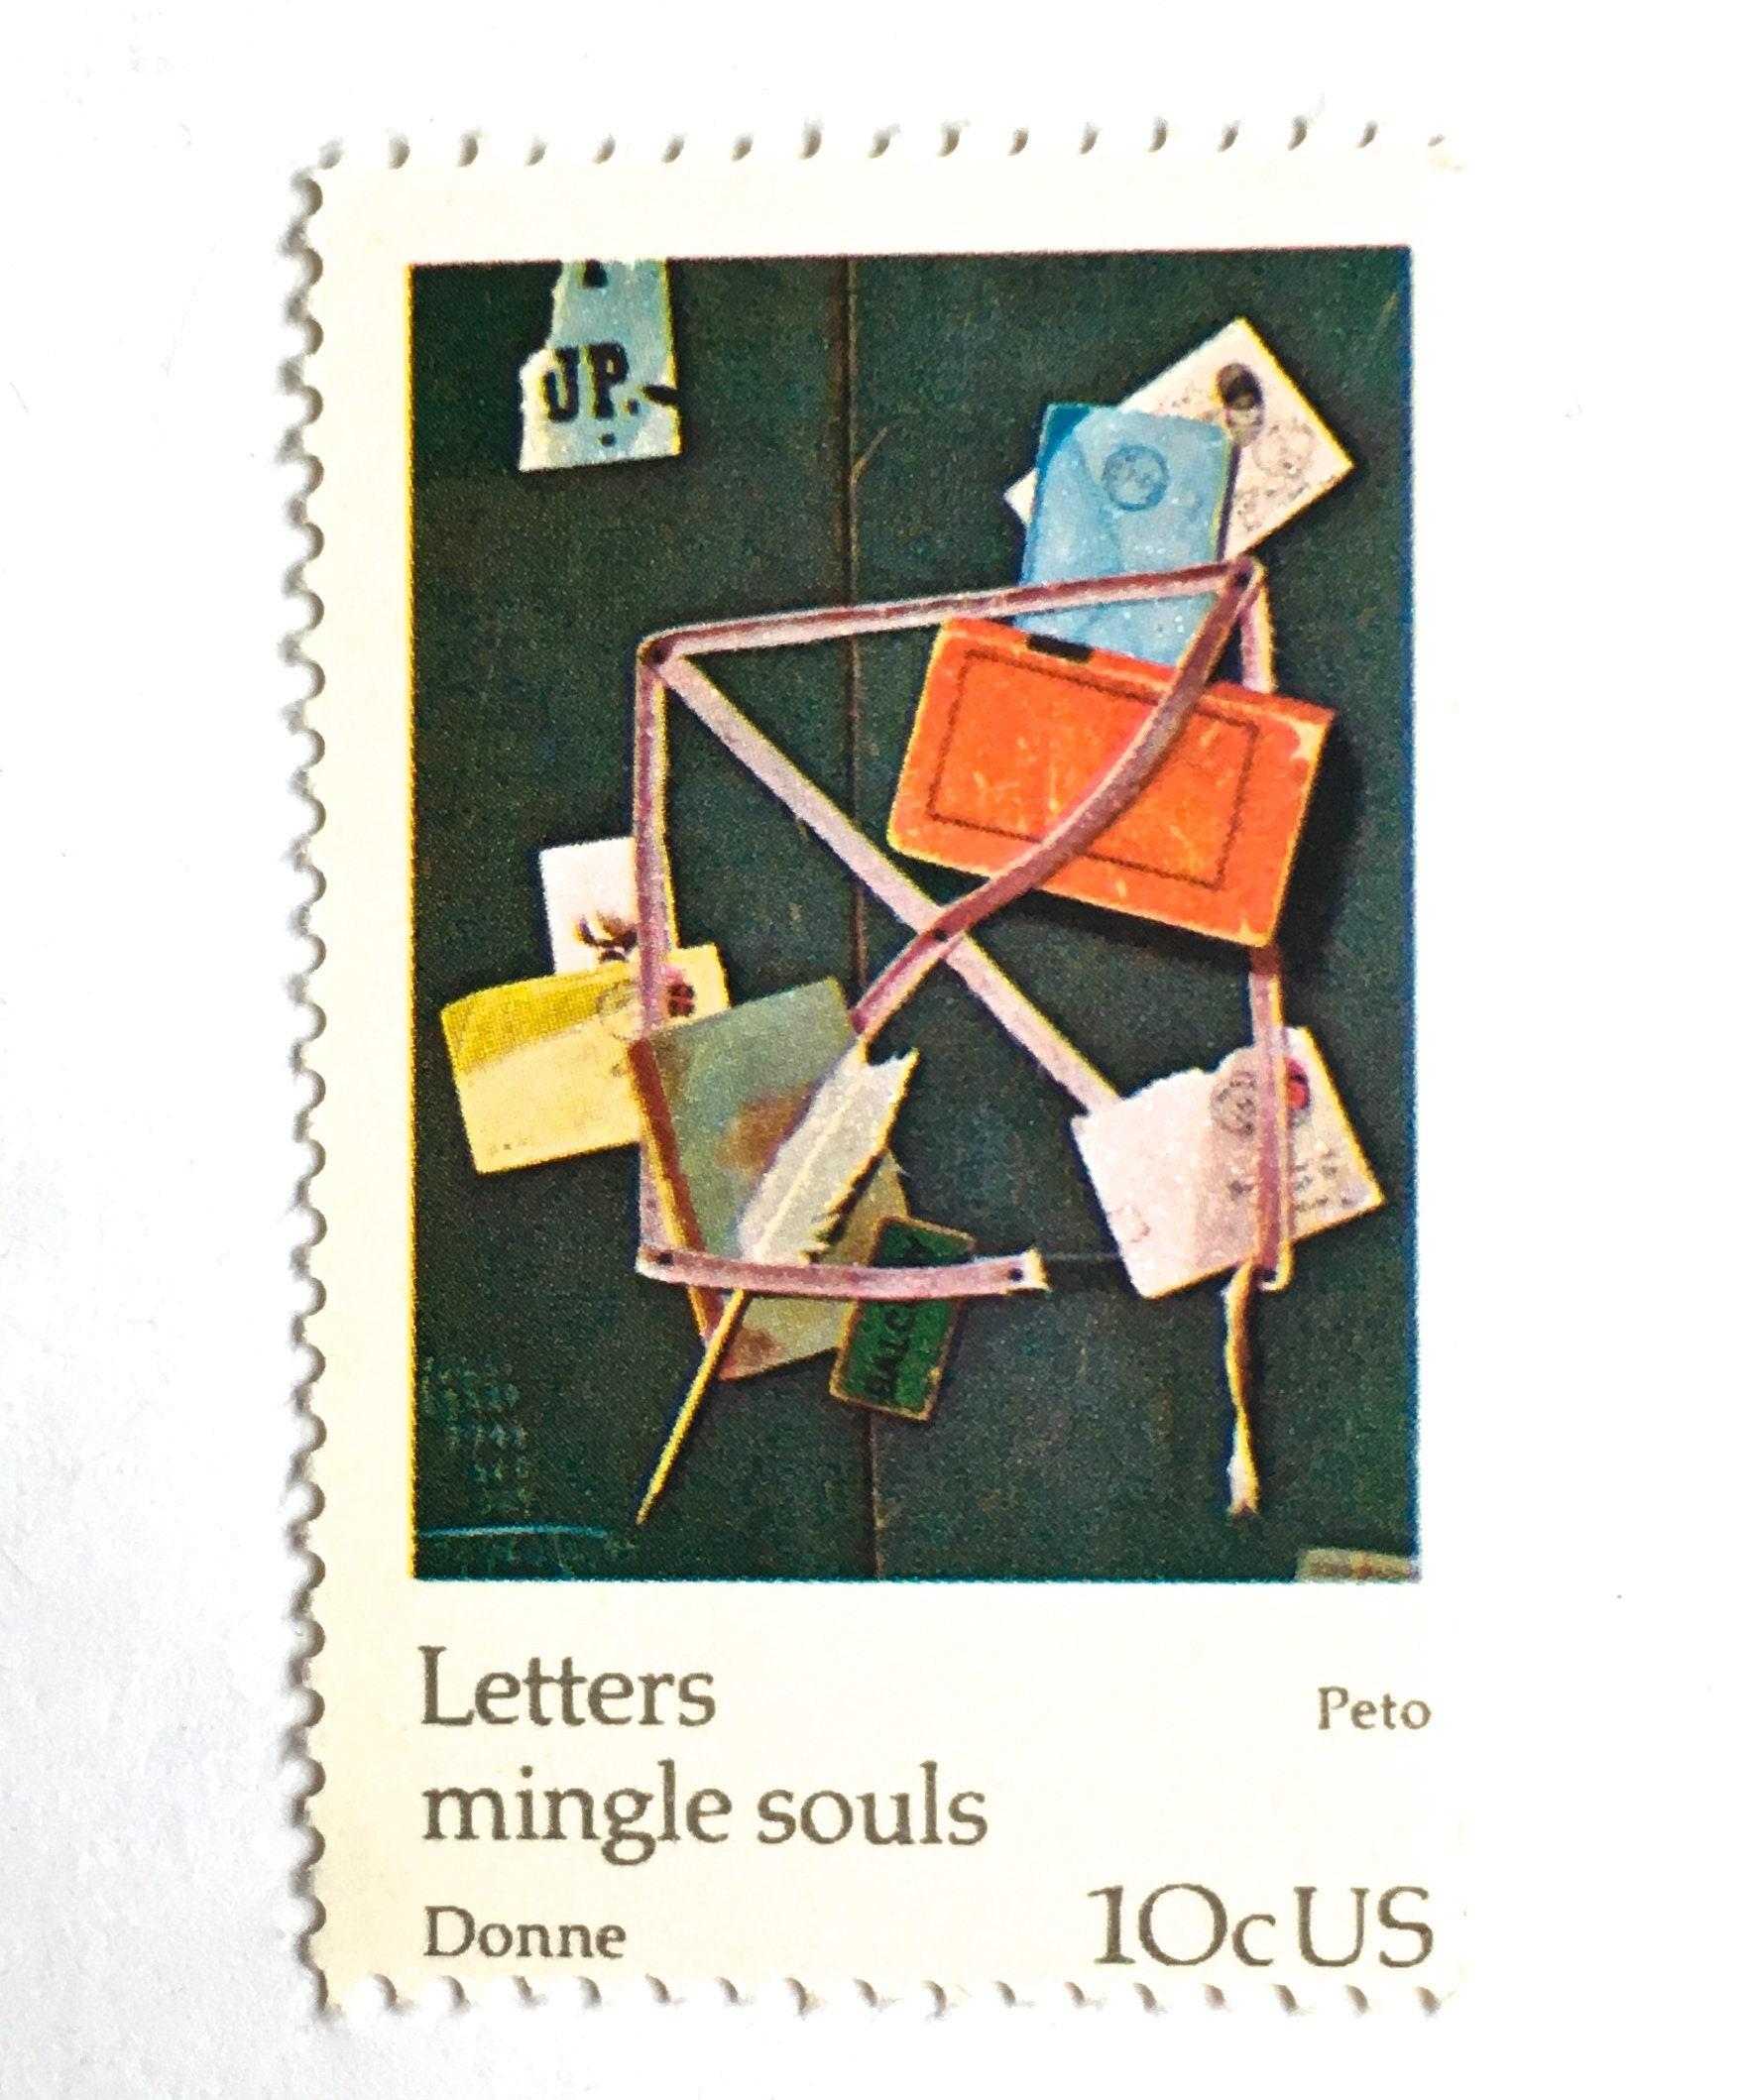 10 letters envelopes postage stamps letters mingle souls etsy